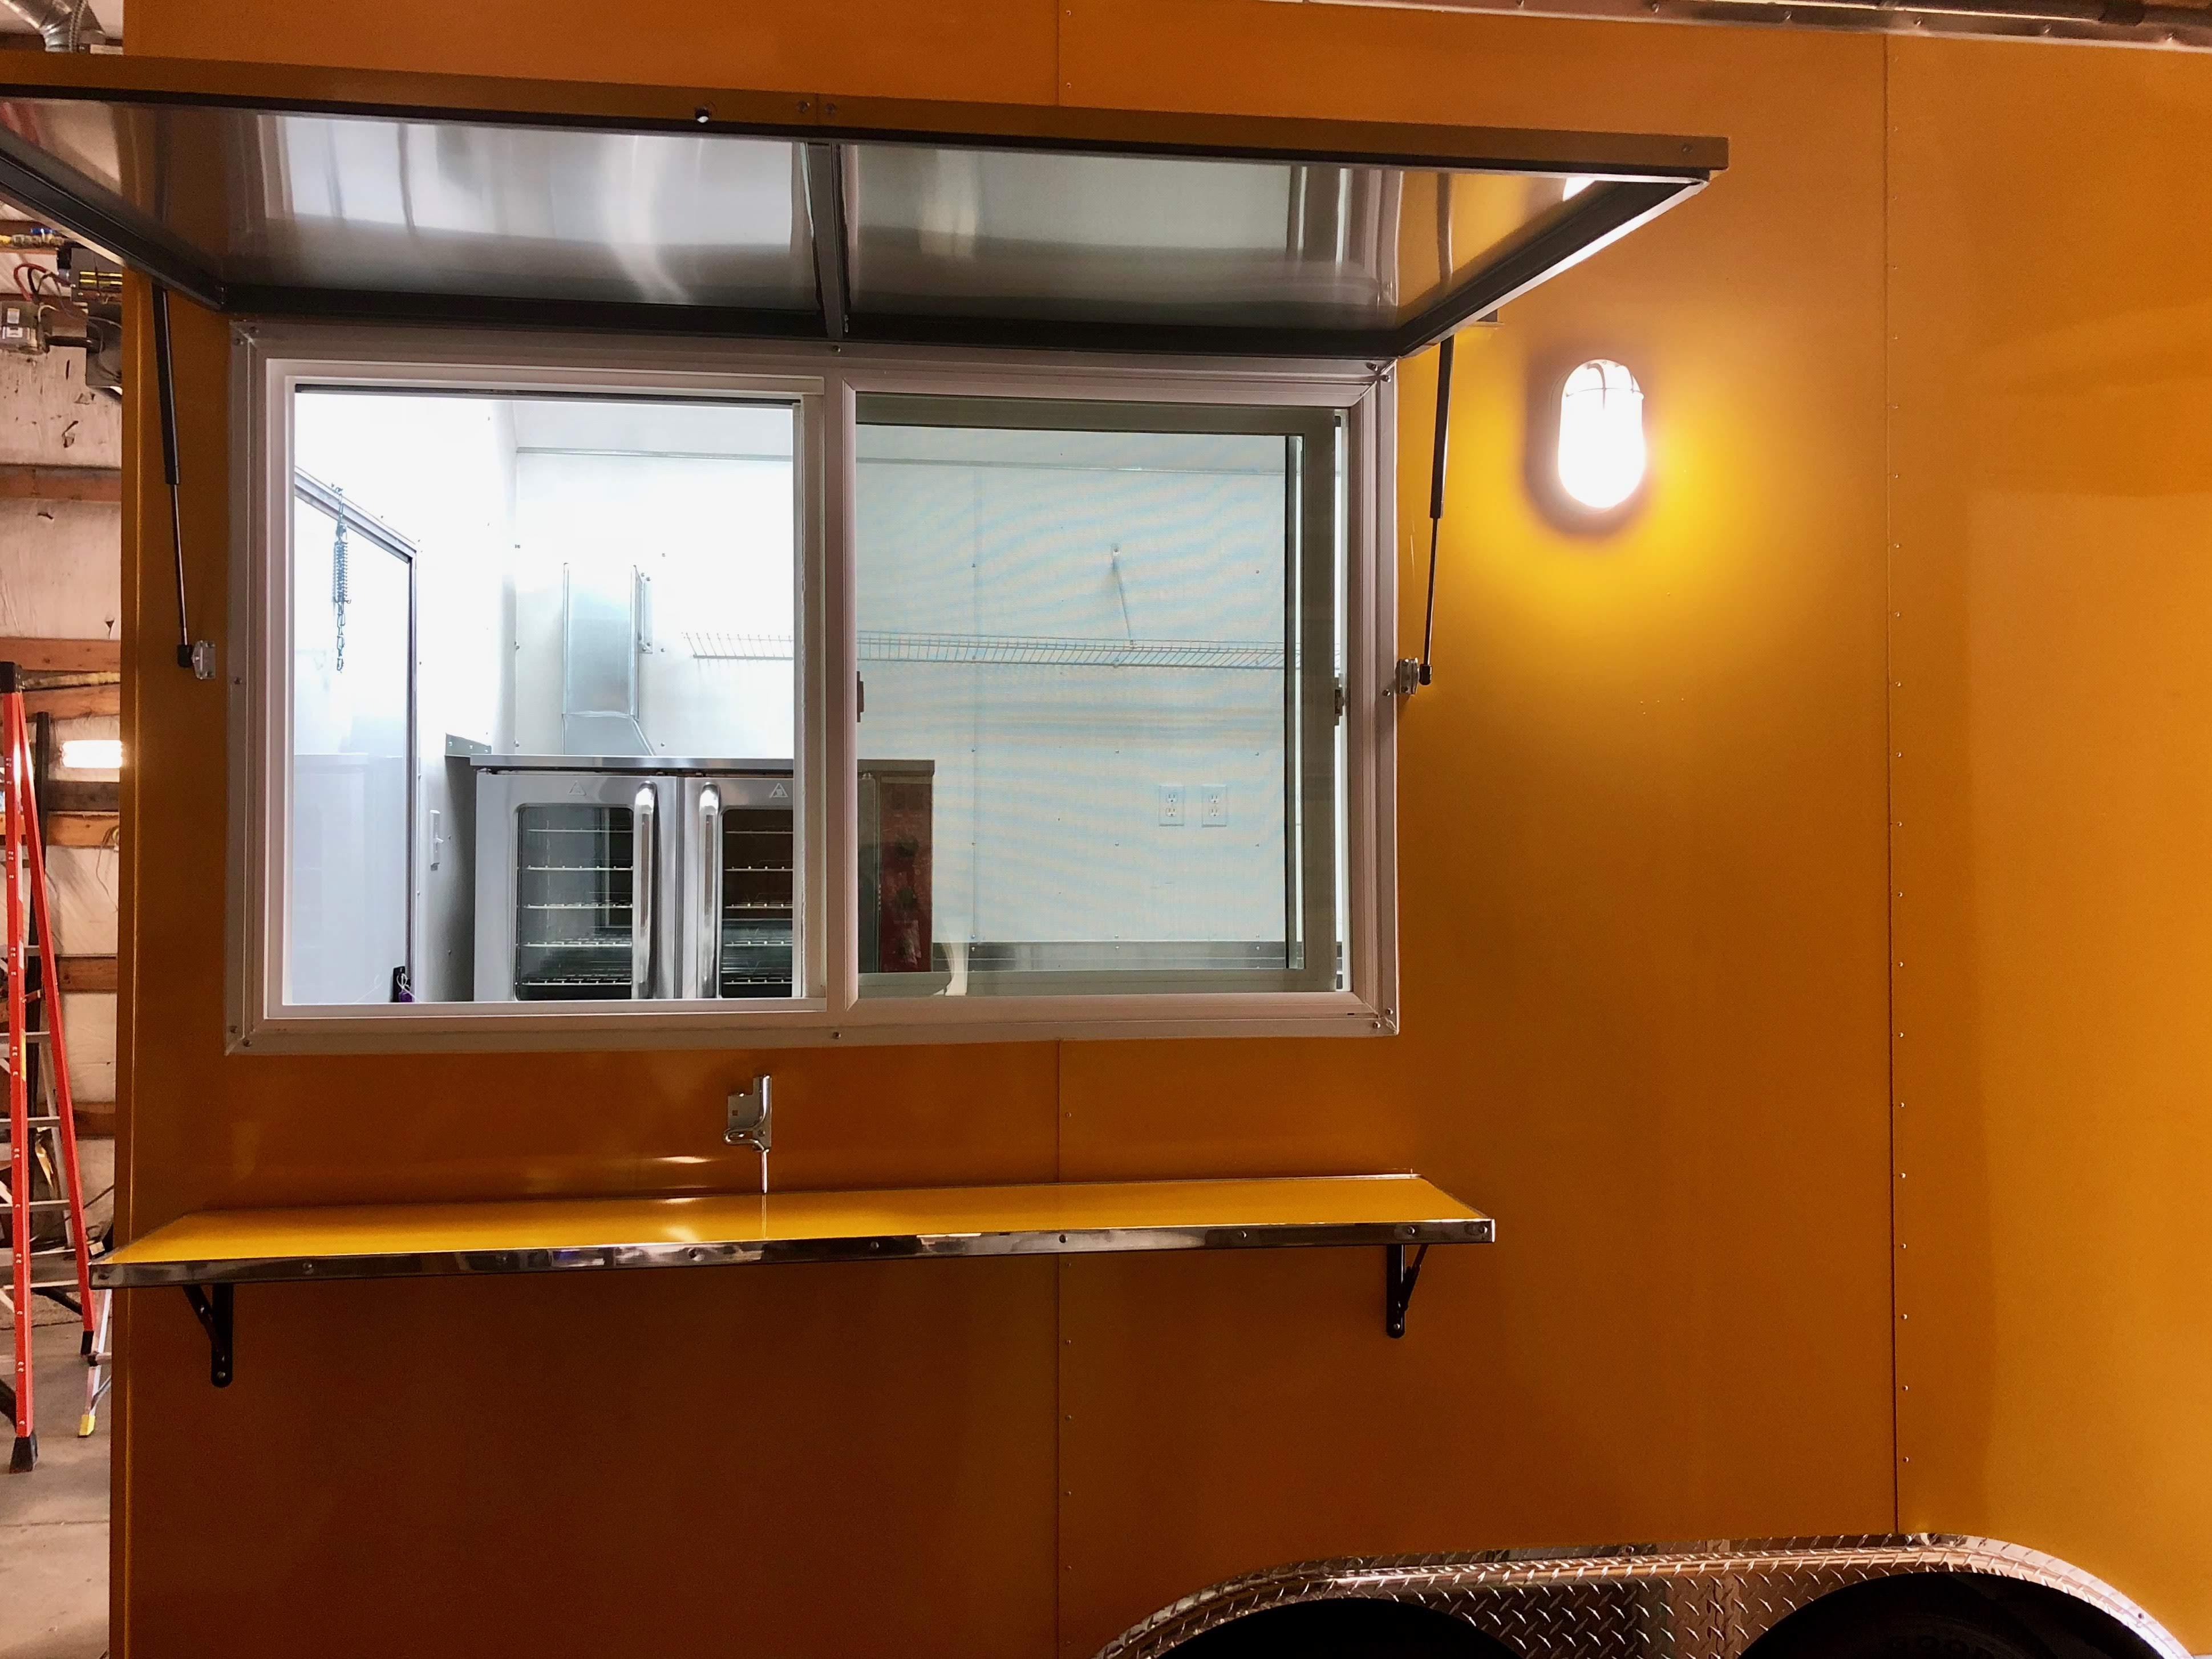 Food truck service window 13